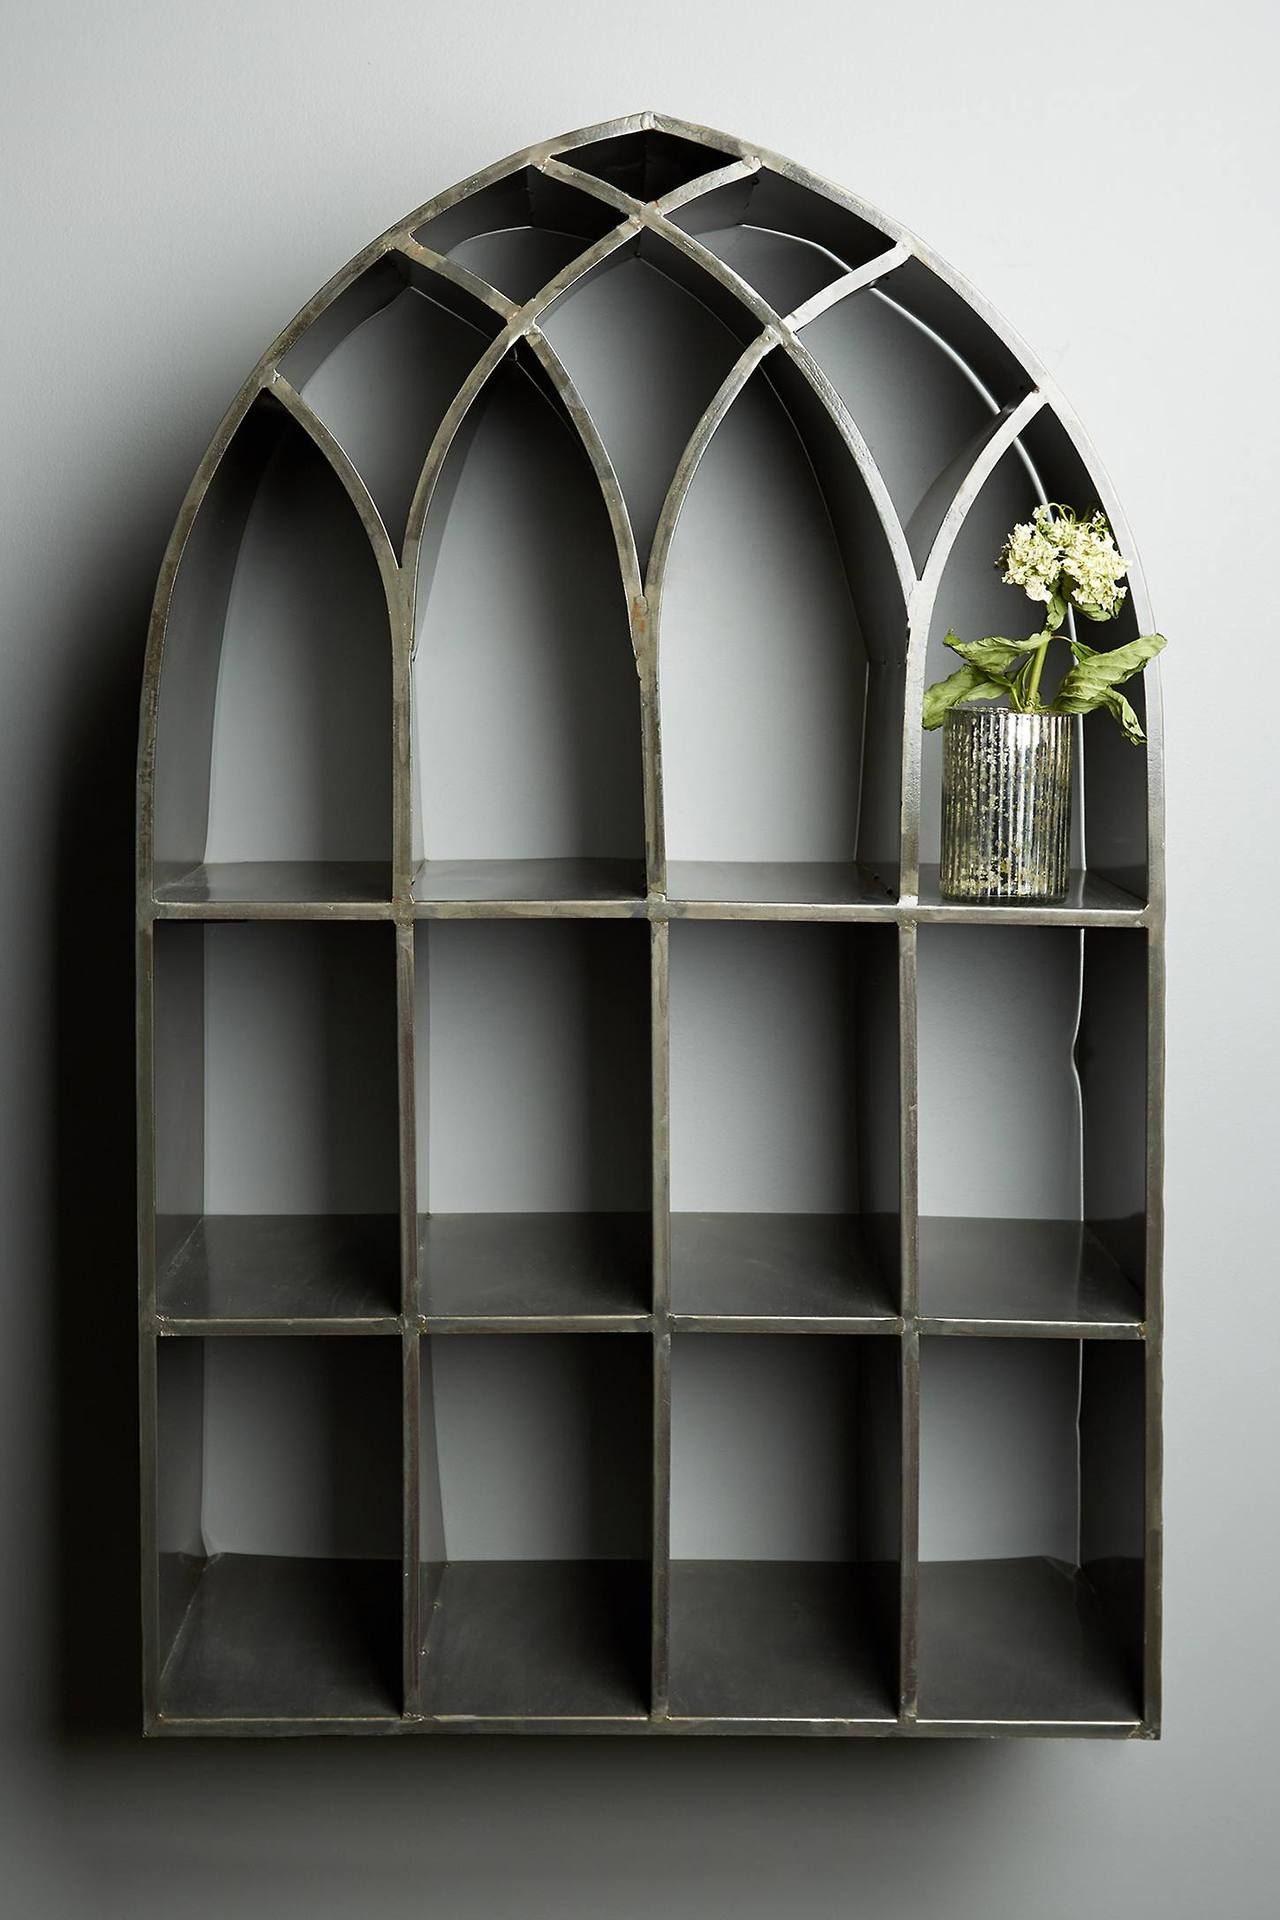 Gothic Arch Shelving Gothic Home Decor Gothic Furniture Gothic